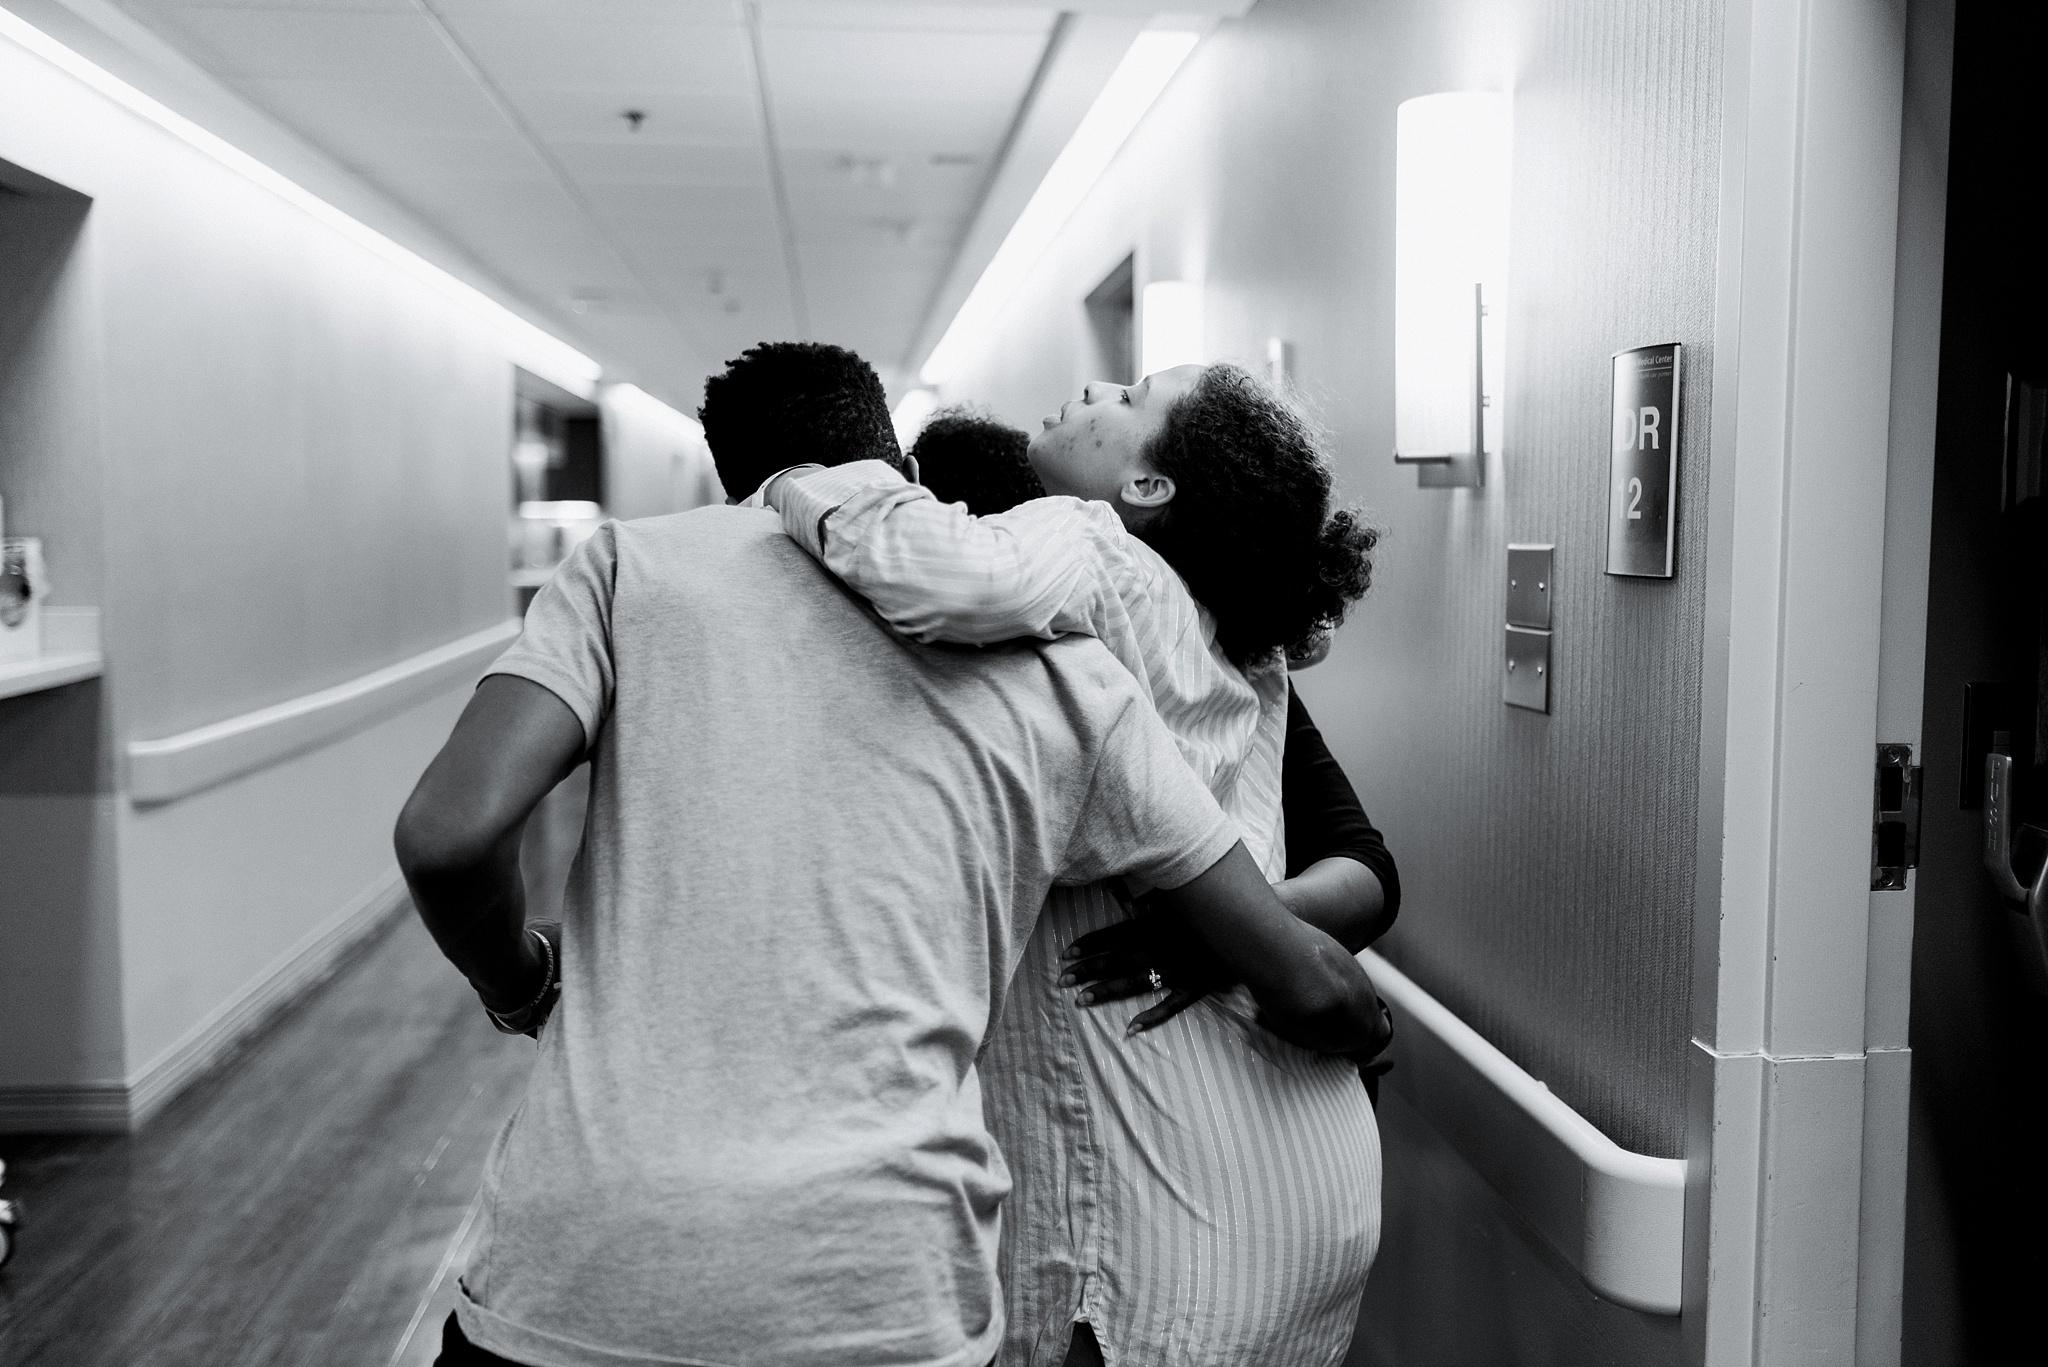 atlanta-medical-center-birth-photographer-nykole-smith-293.jpg